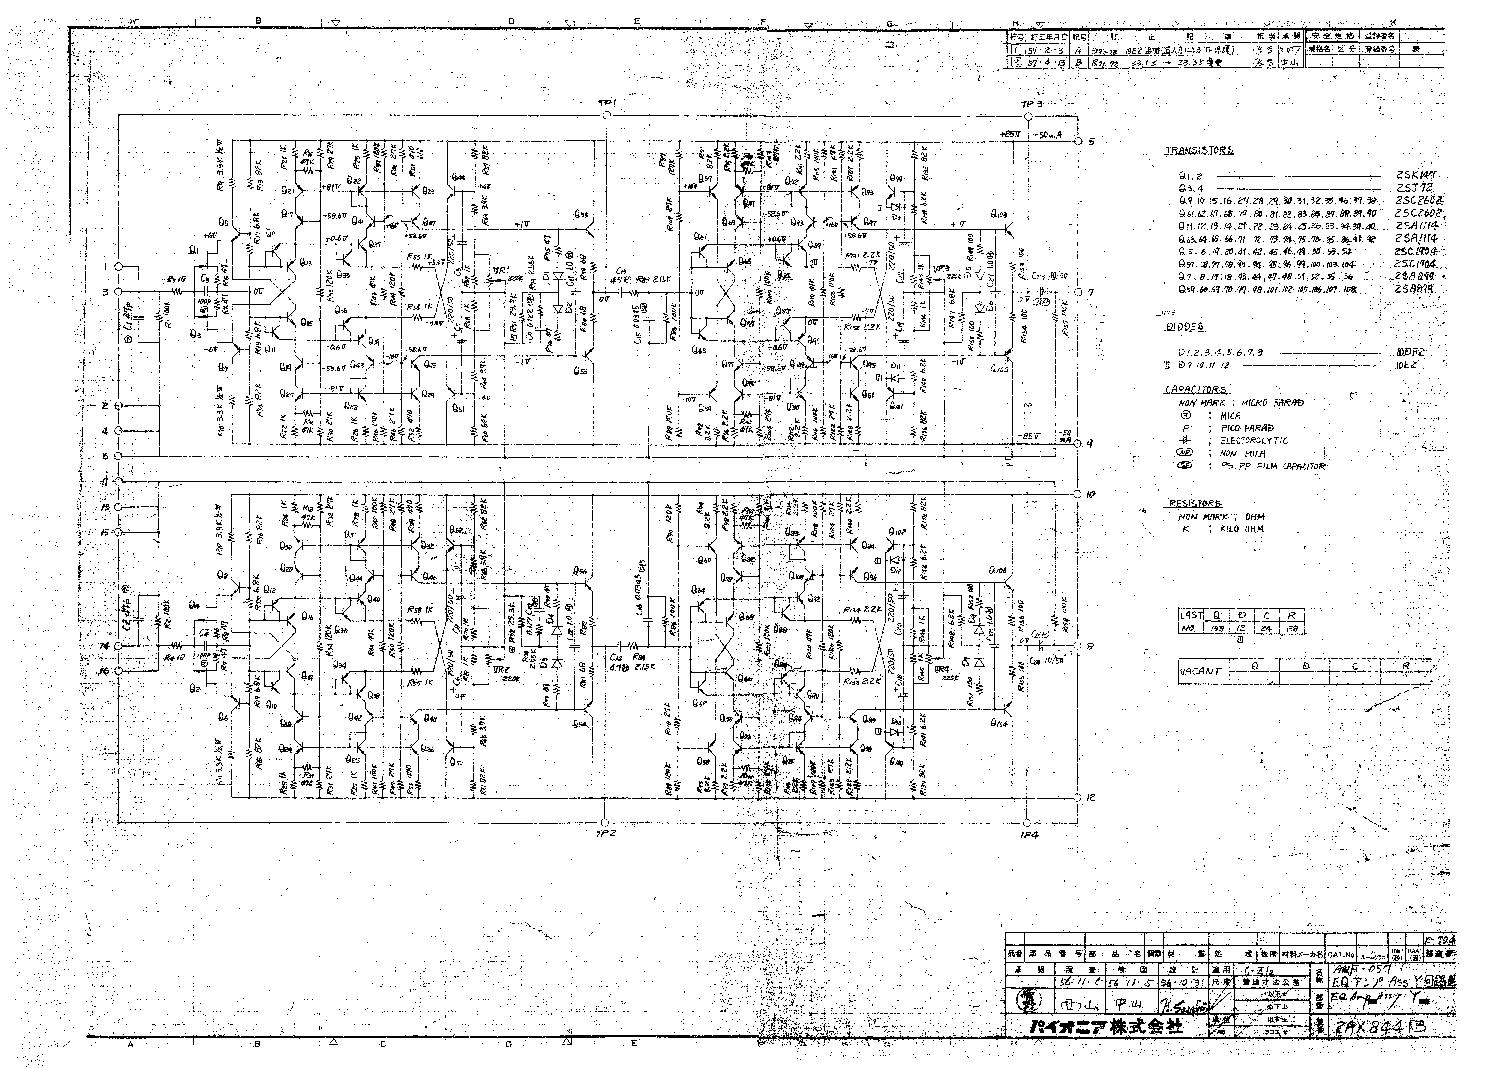 pioneer sa-600 service manual